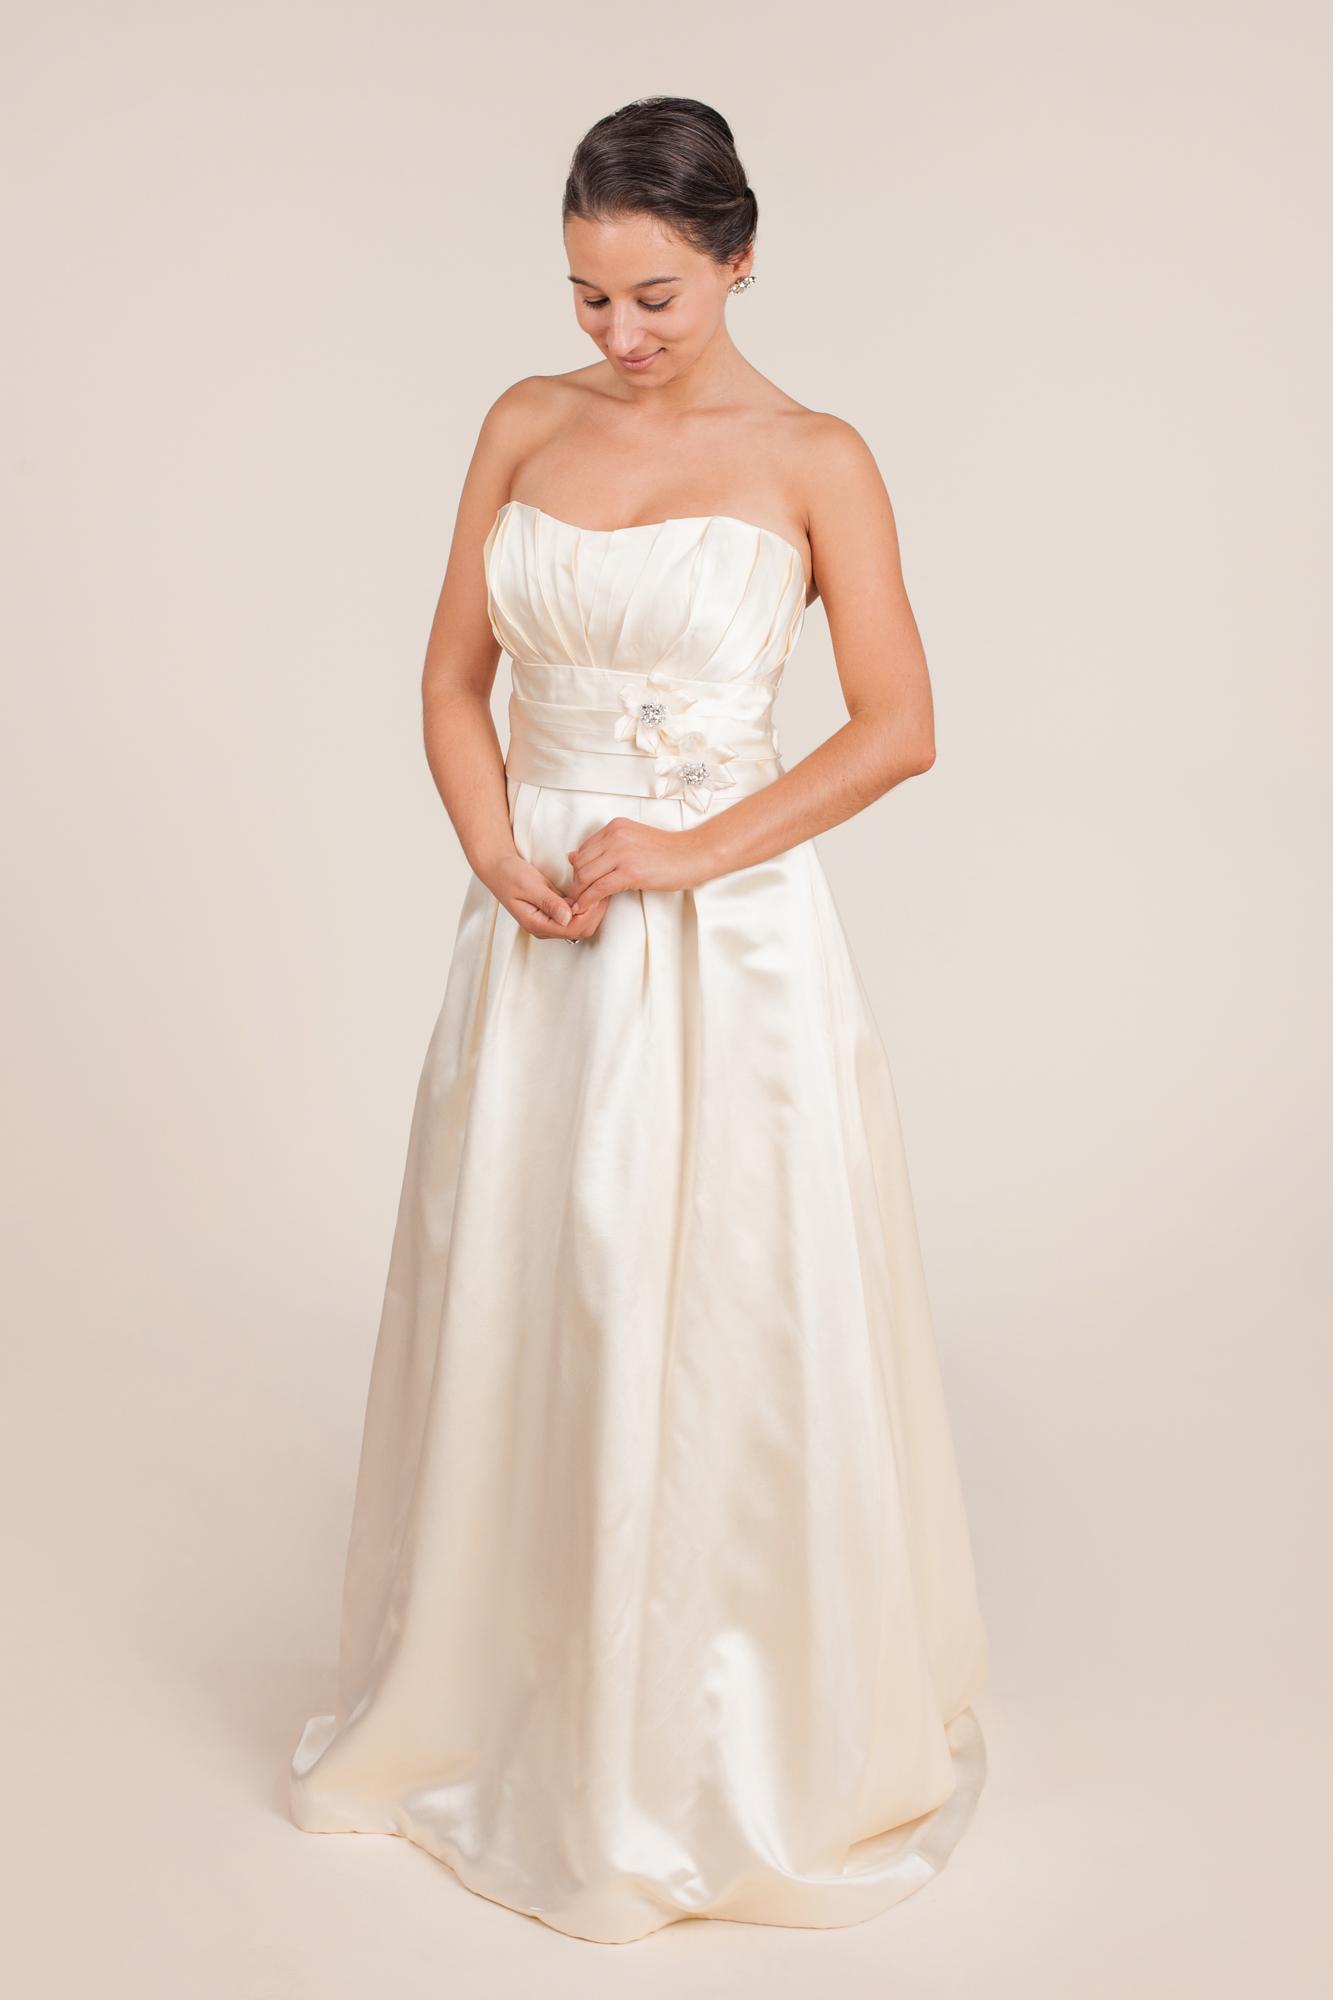 Paloma blanca size 0 - $720 - (28% OFF)